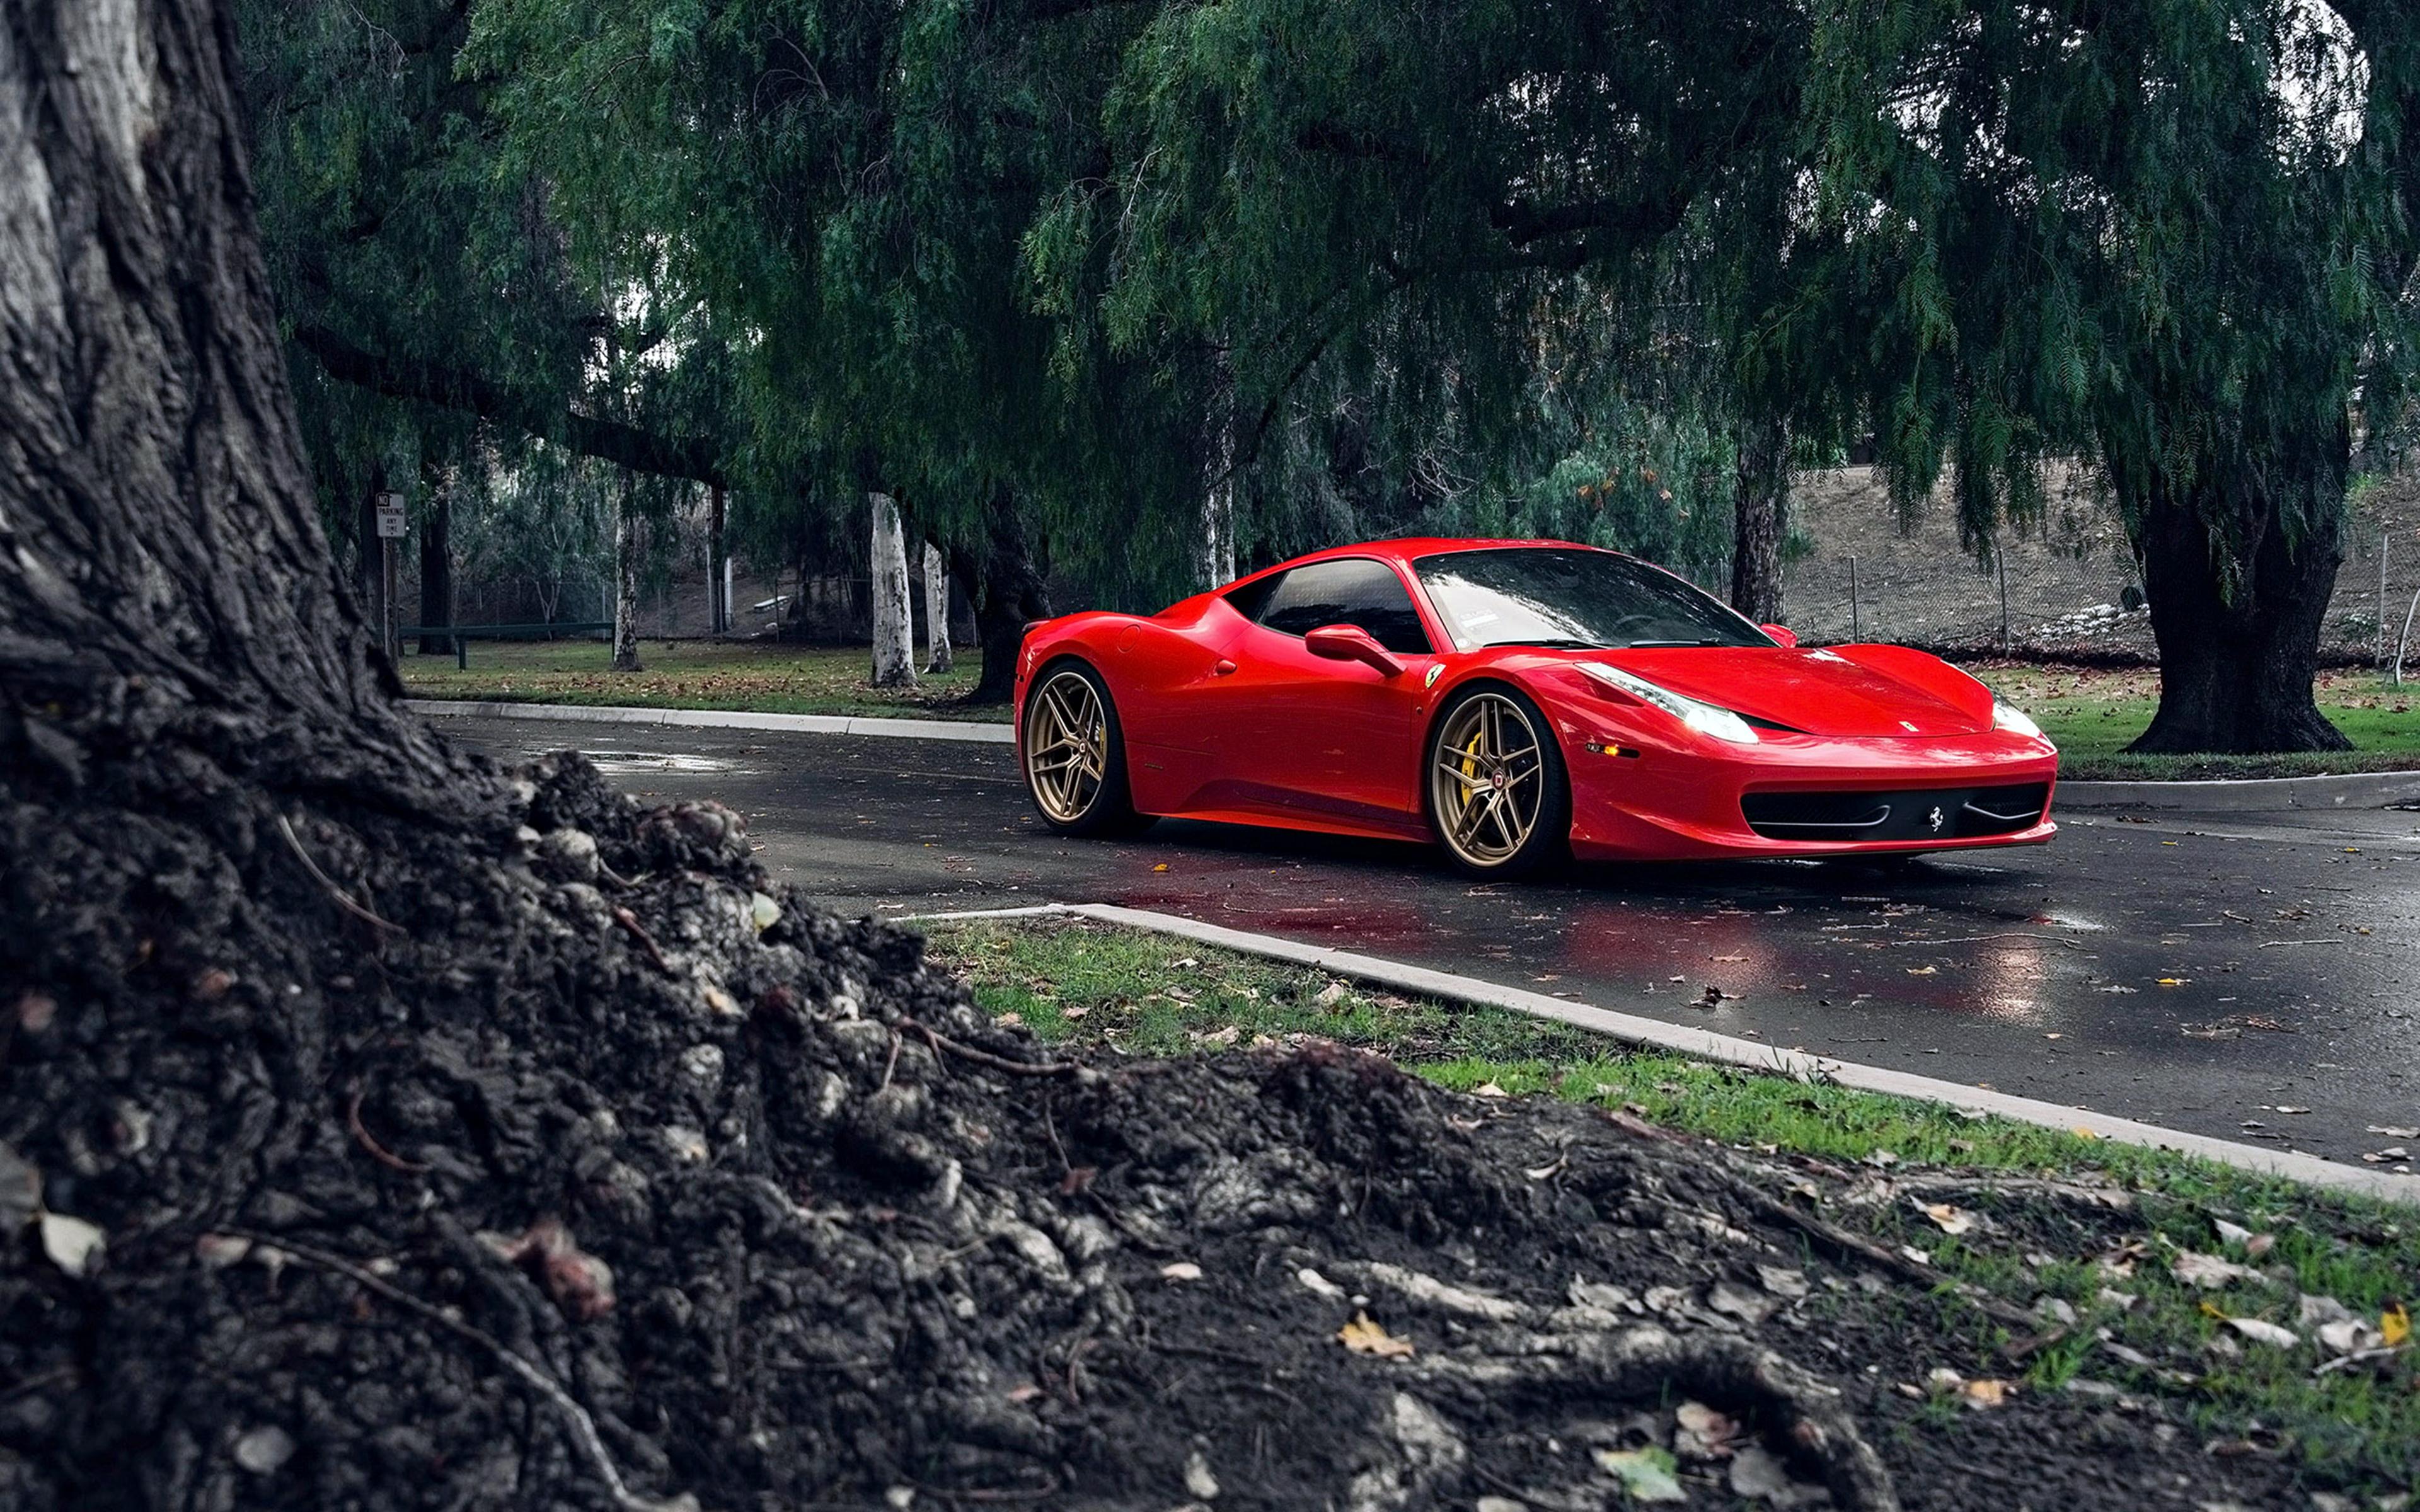 Ferrari 458 Italy 4k Ultra Hd Wallpaper Background Image